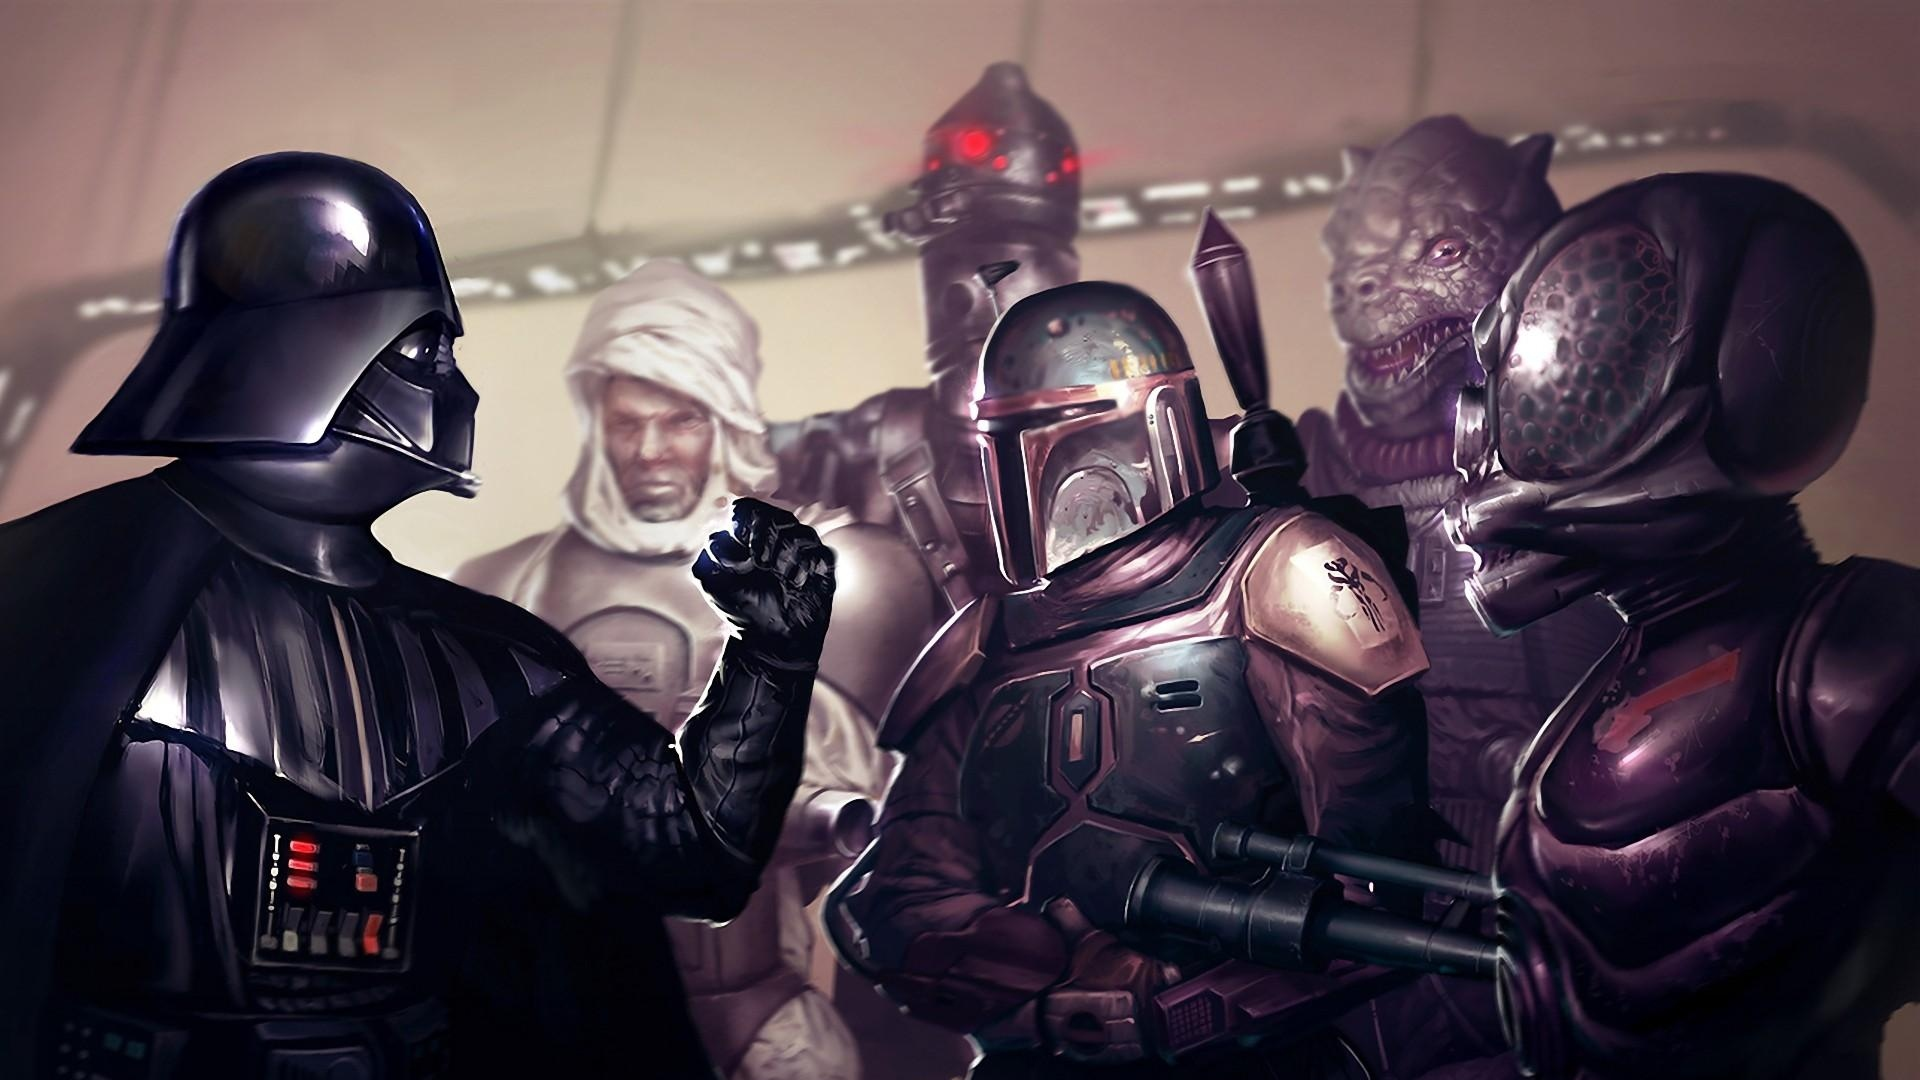 Download Wallpaper 1920x1080 Star Wars Darth Vader Boba Fett Fist Full Hd 1080p Hd Background